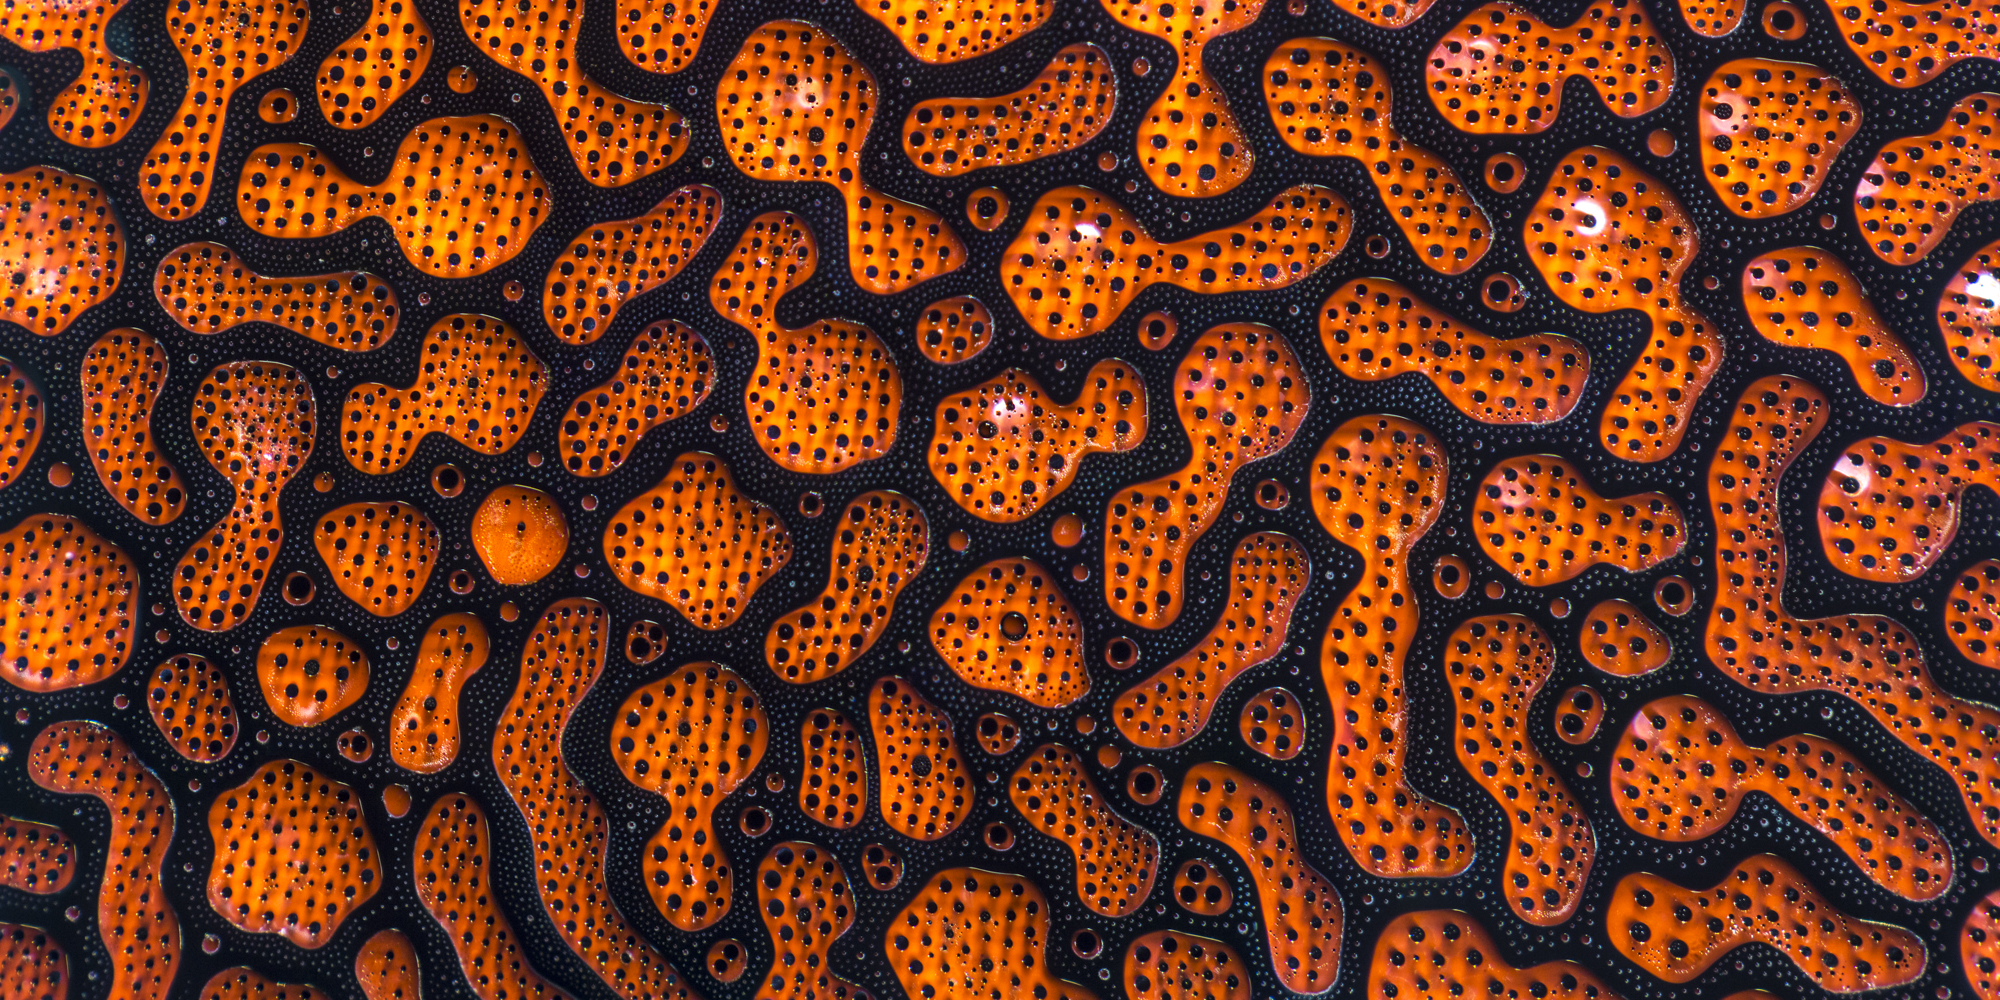 Ferrofluid 7